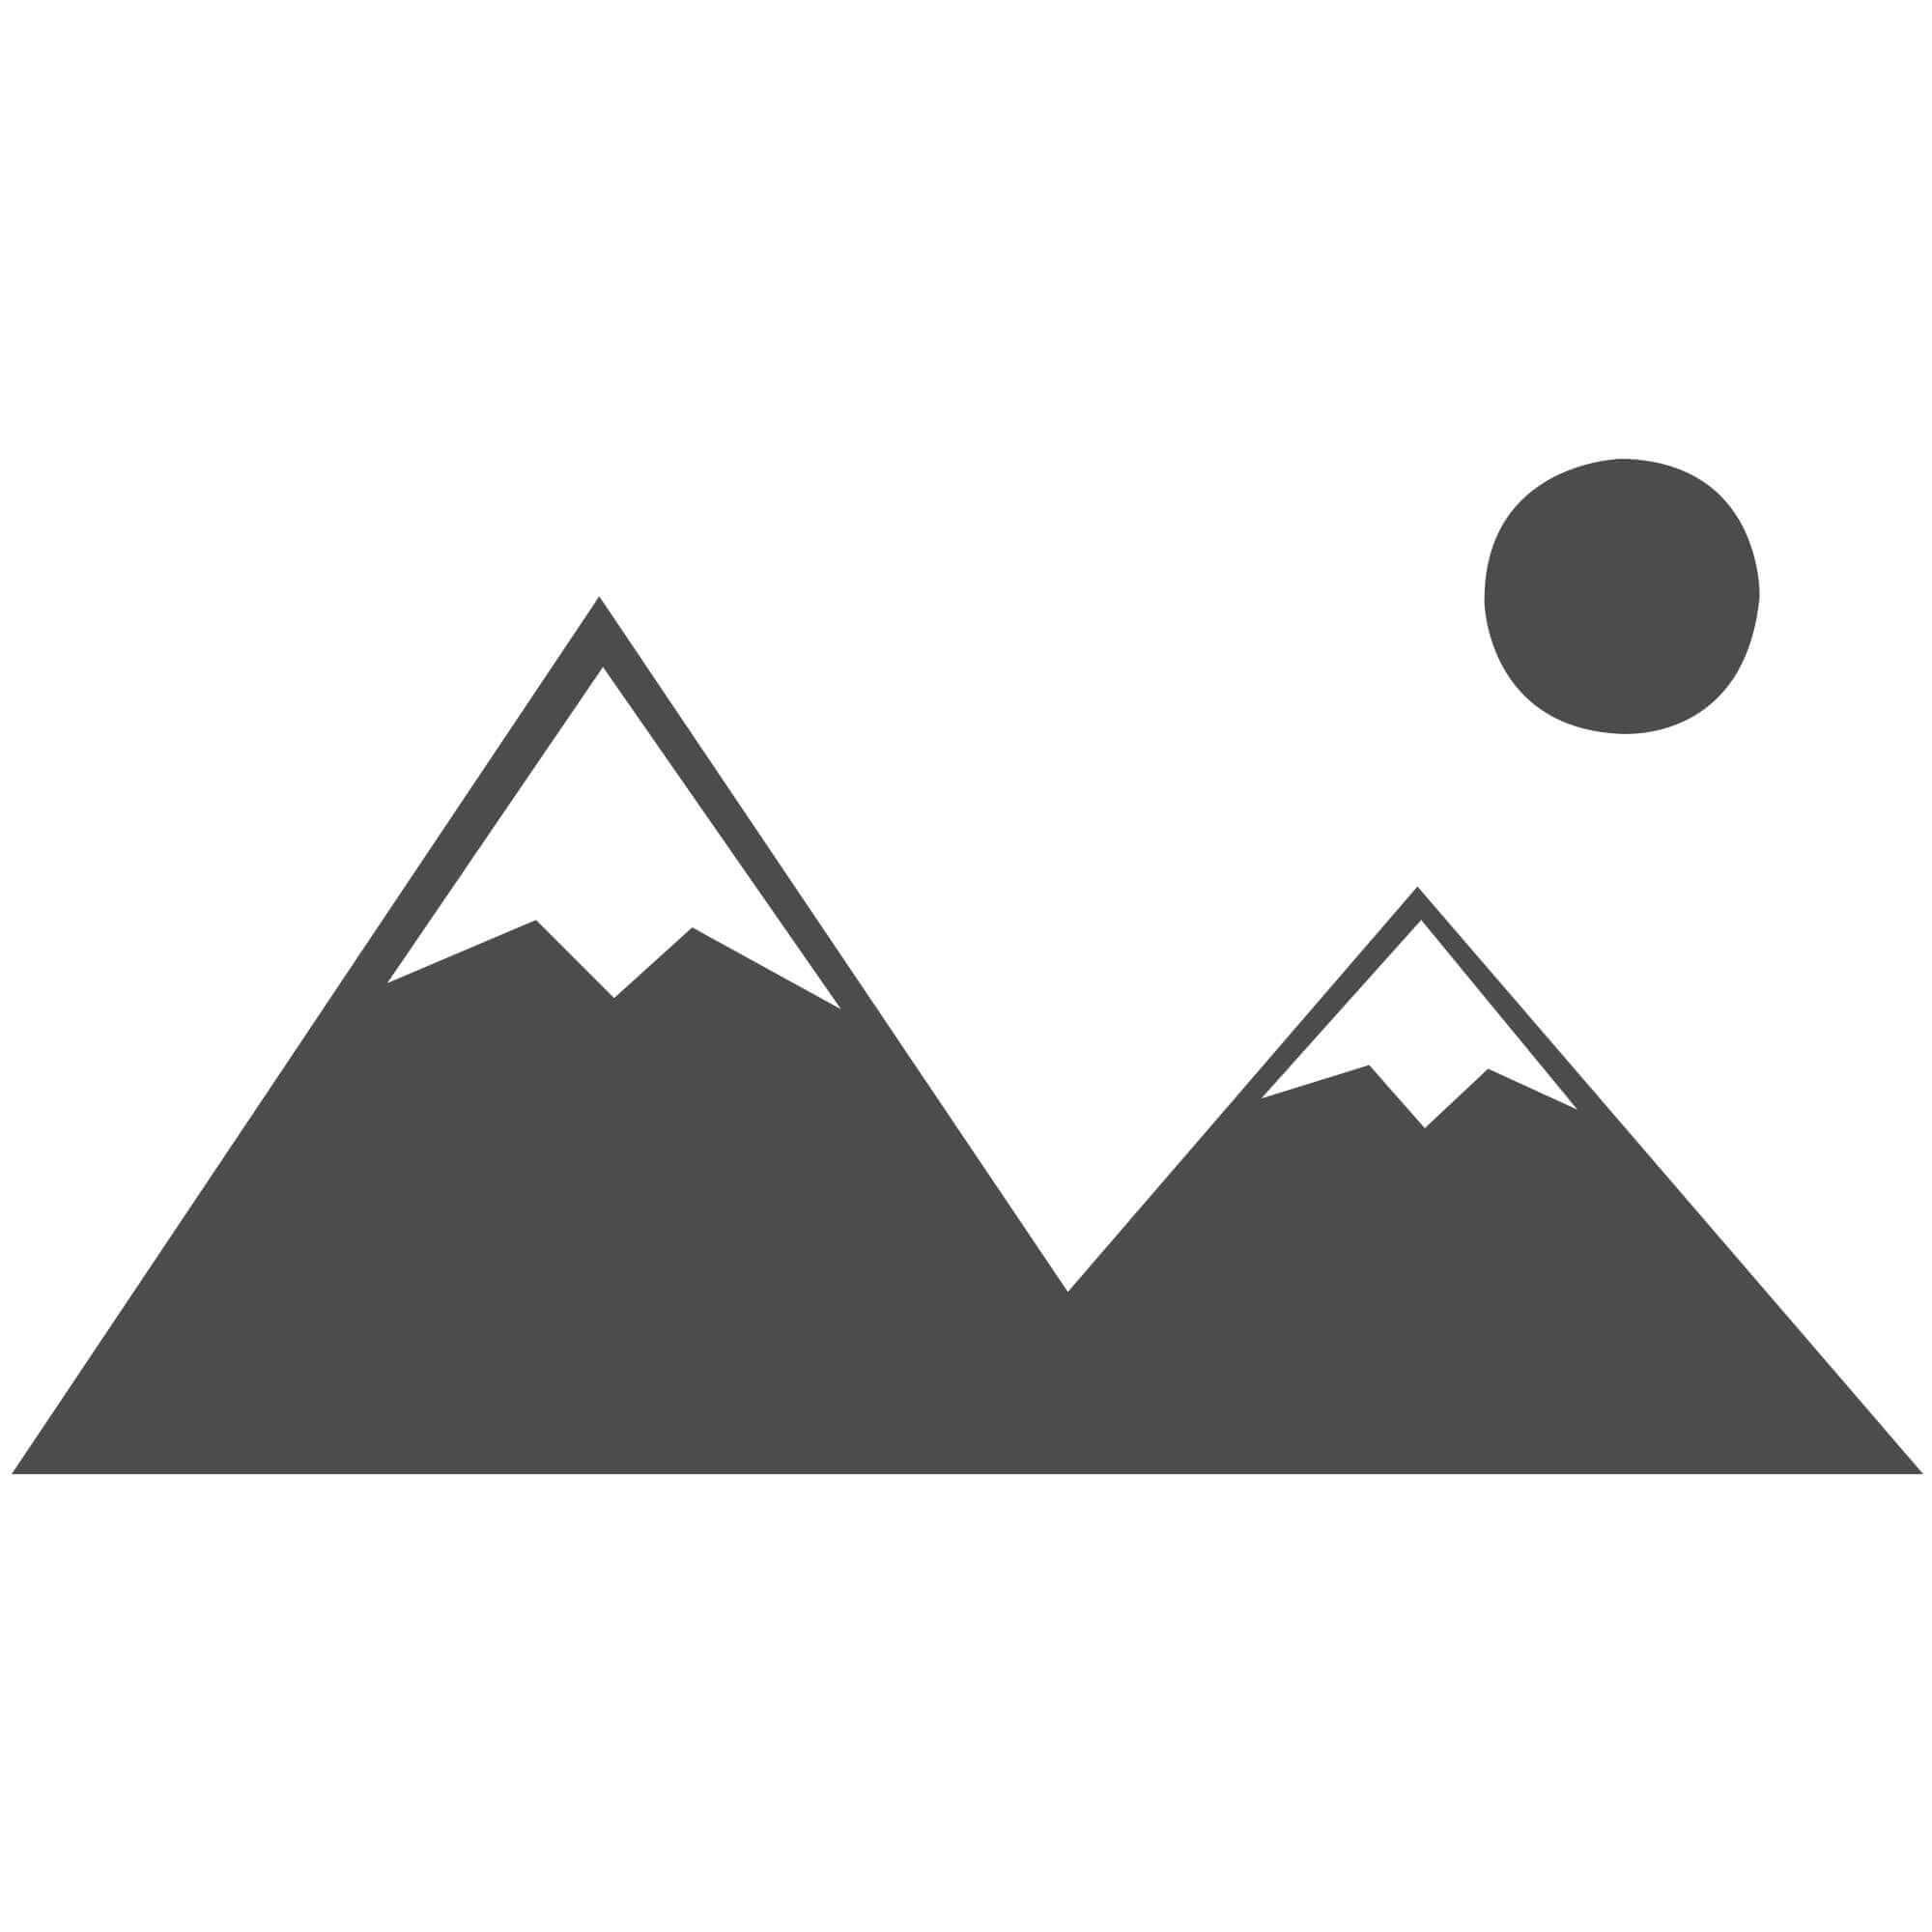 "Ottoman Temple Rug - Cream - Size 80 x 150 cm (2'8"" x 5')"